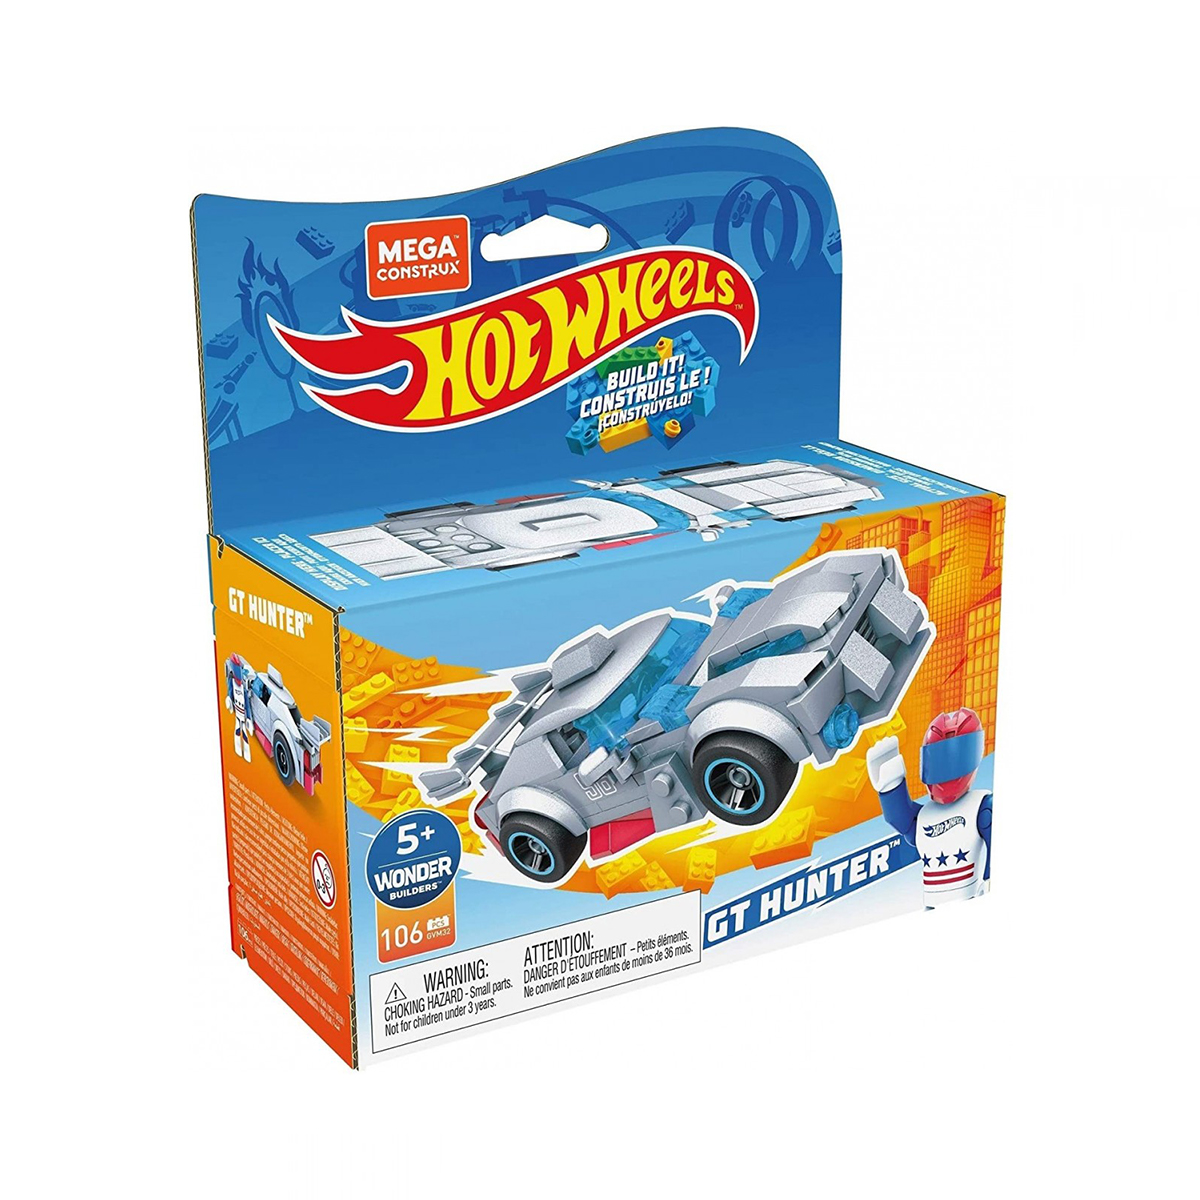 Masinuta Hot Wheels, MegaConstrux, Rockin Racers, GVM32